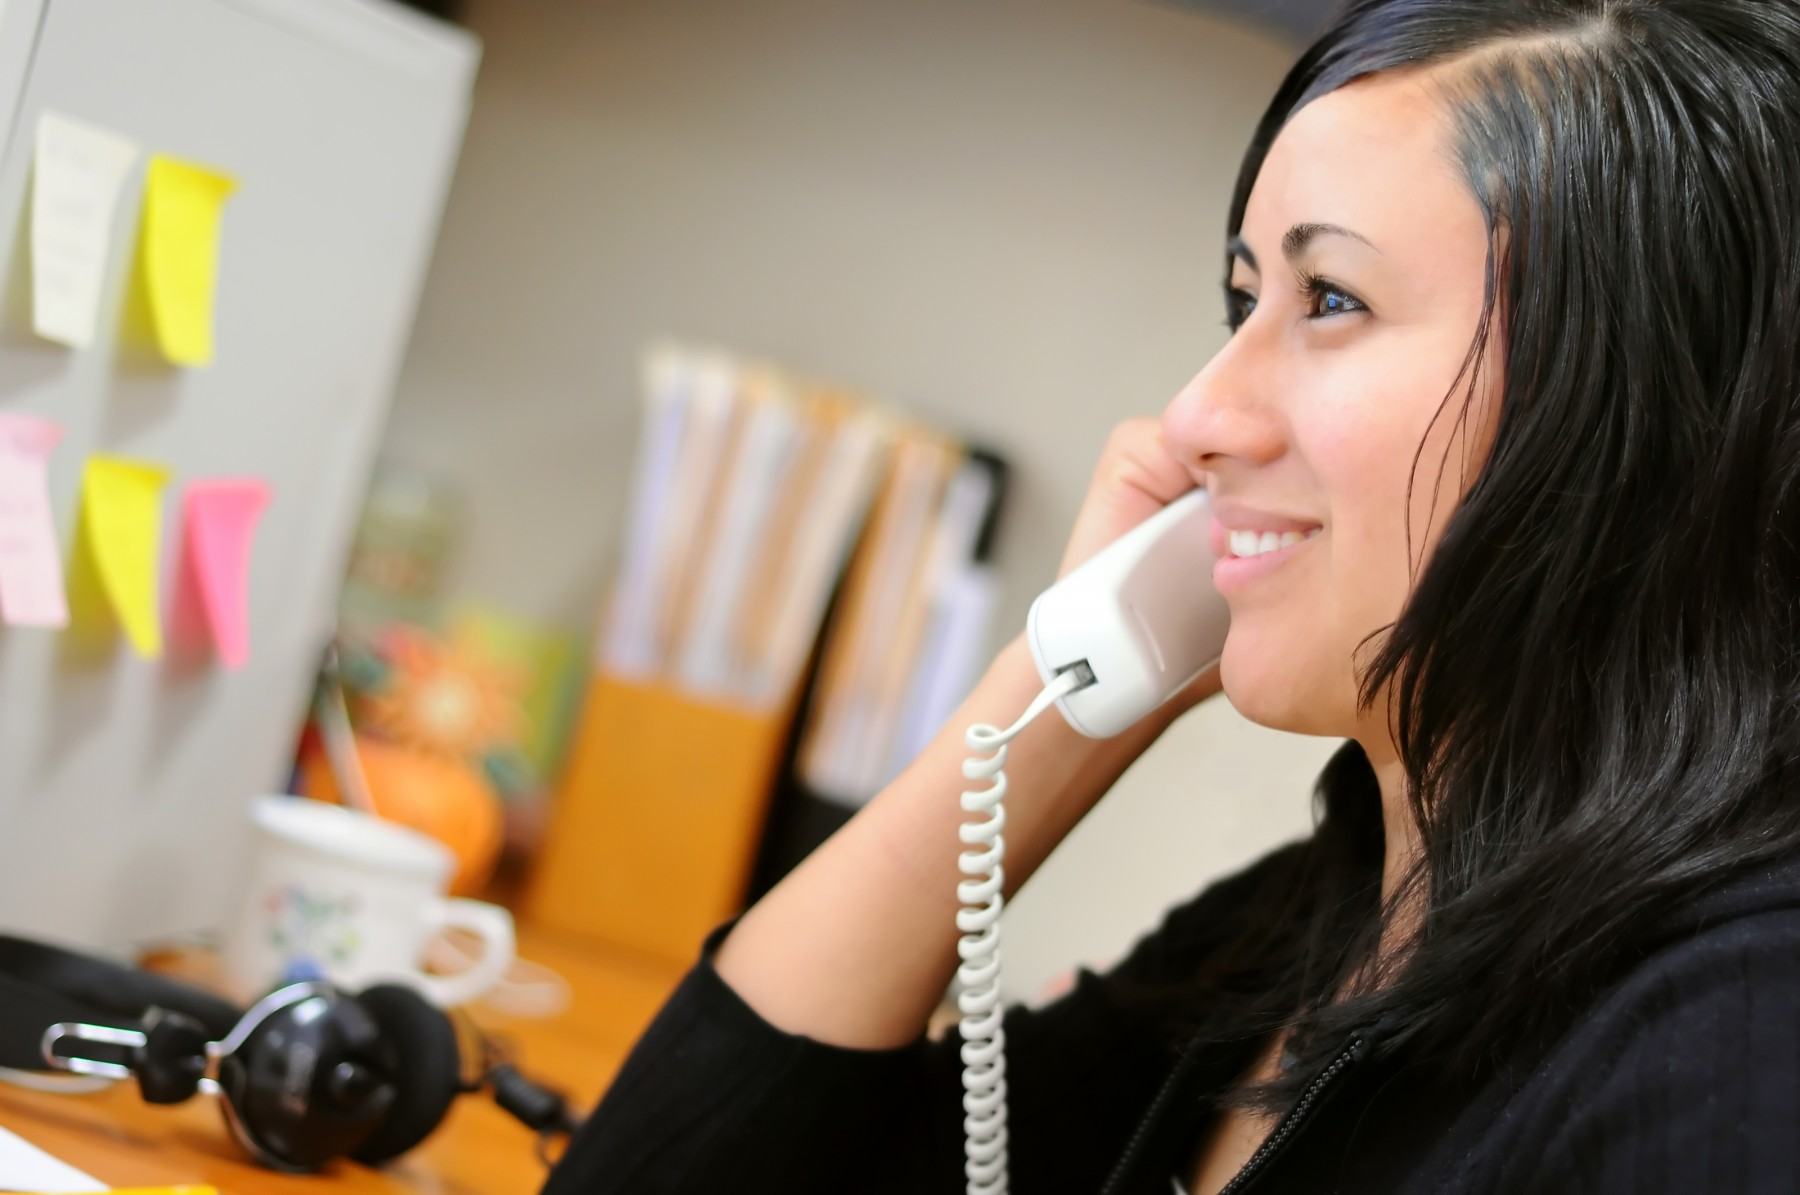 stockvault-woman-on-the-phone115010-e1438536032454